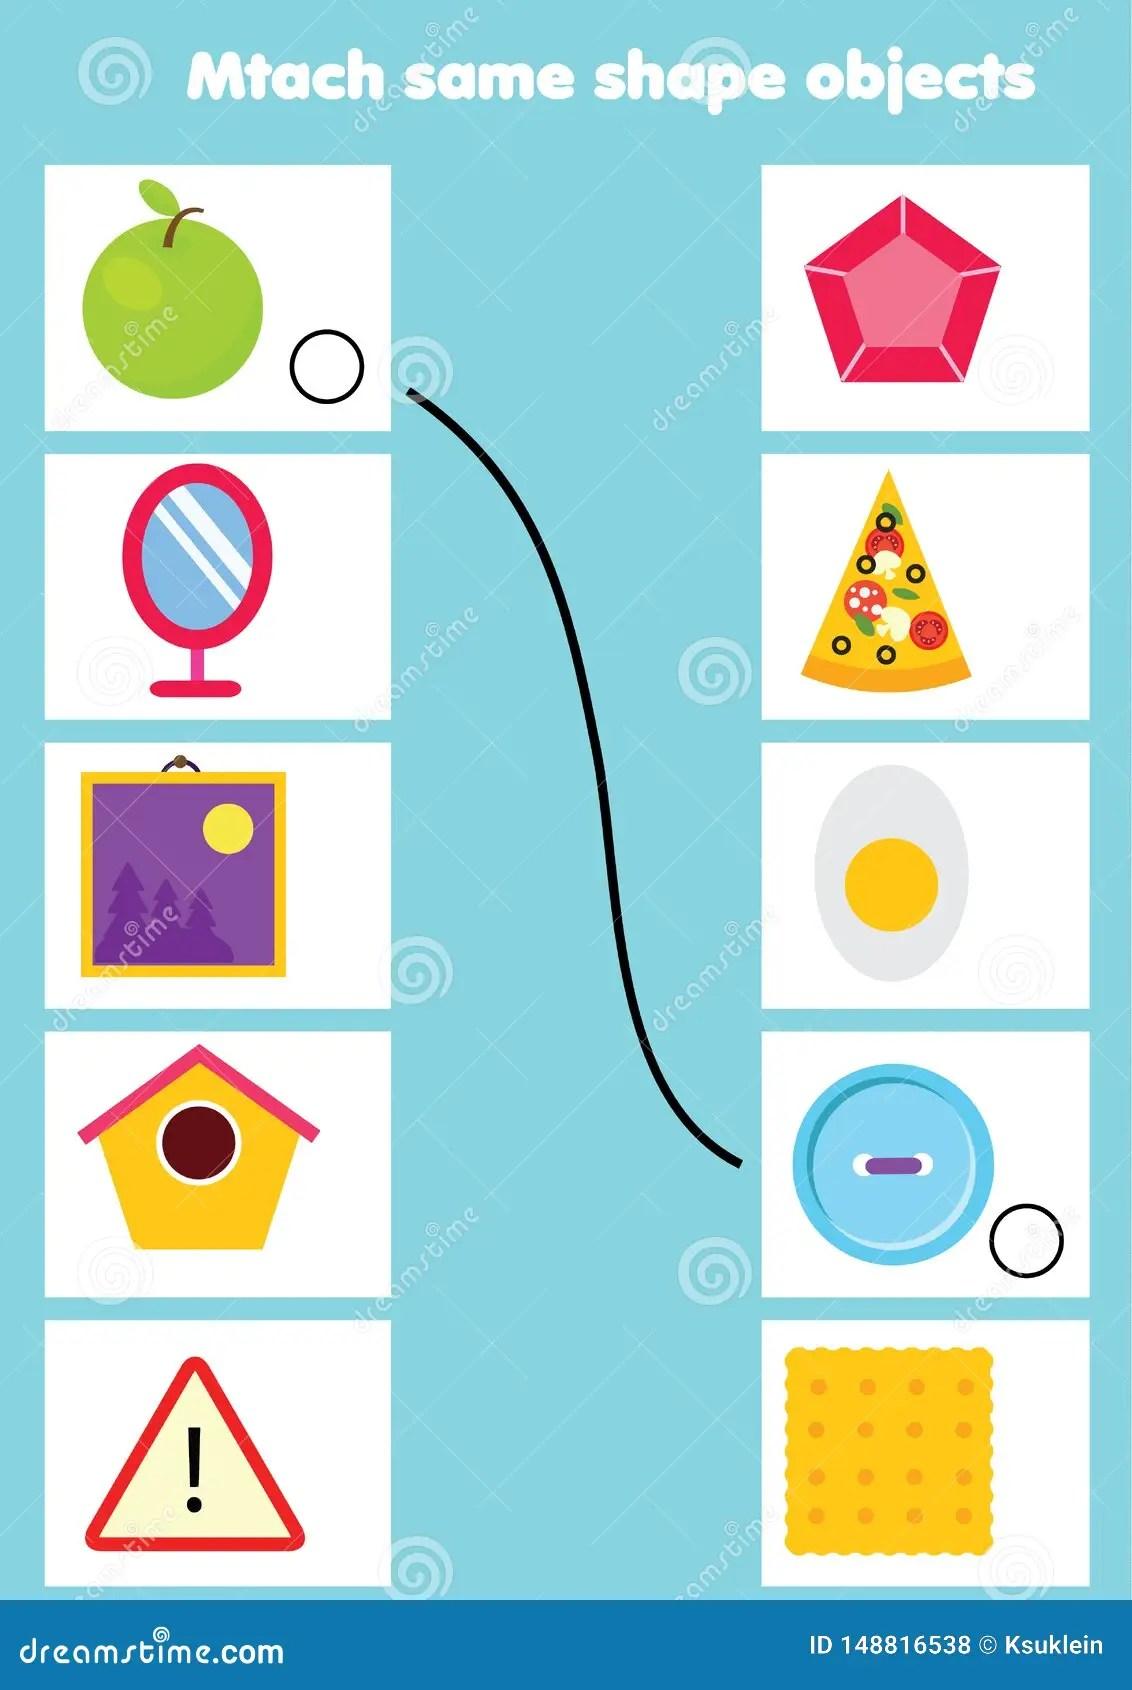 Matching Tools Worksheet For Kids